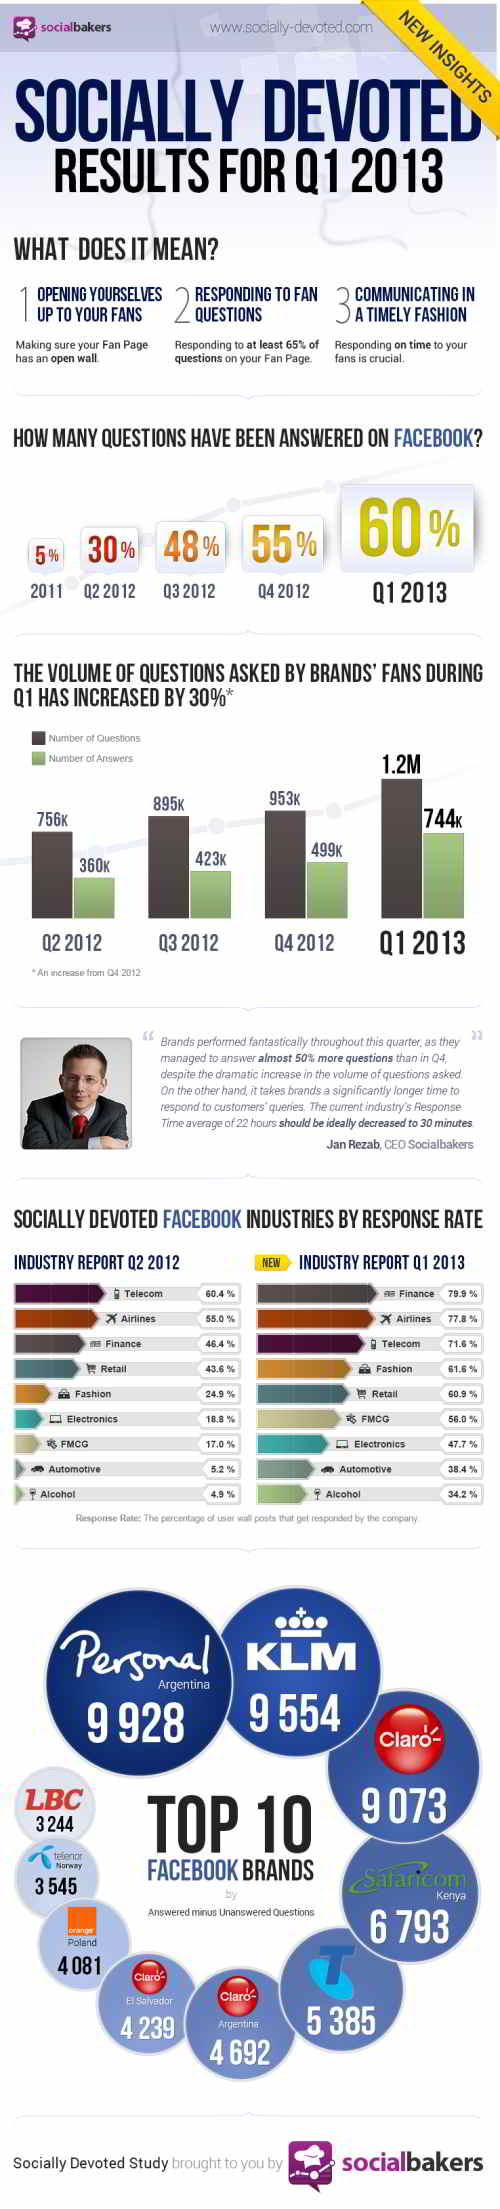 sociallydevoted-q1-2013